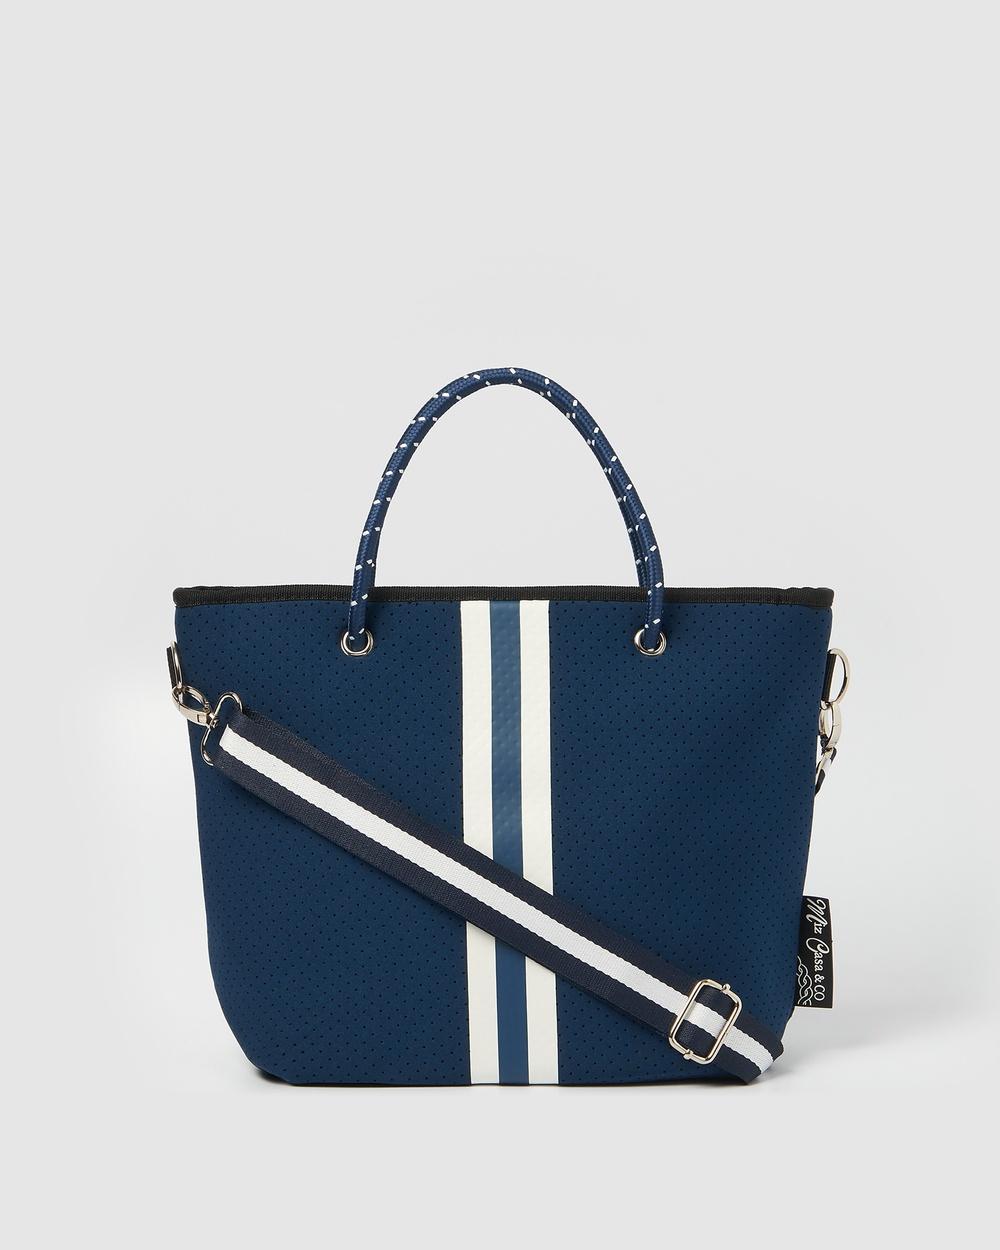 Miz Casa and Co Beverly Neoprene Mini Tote Bag Bags Navy